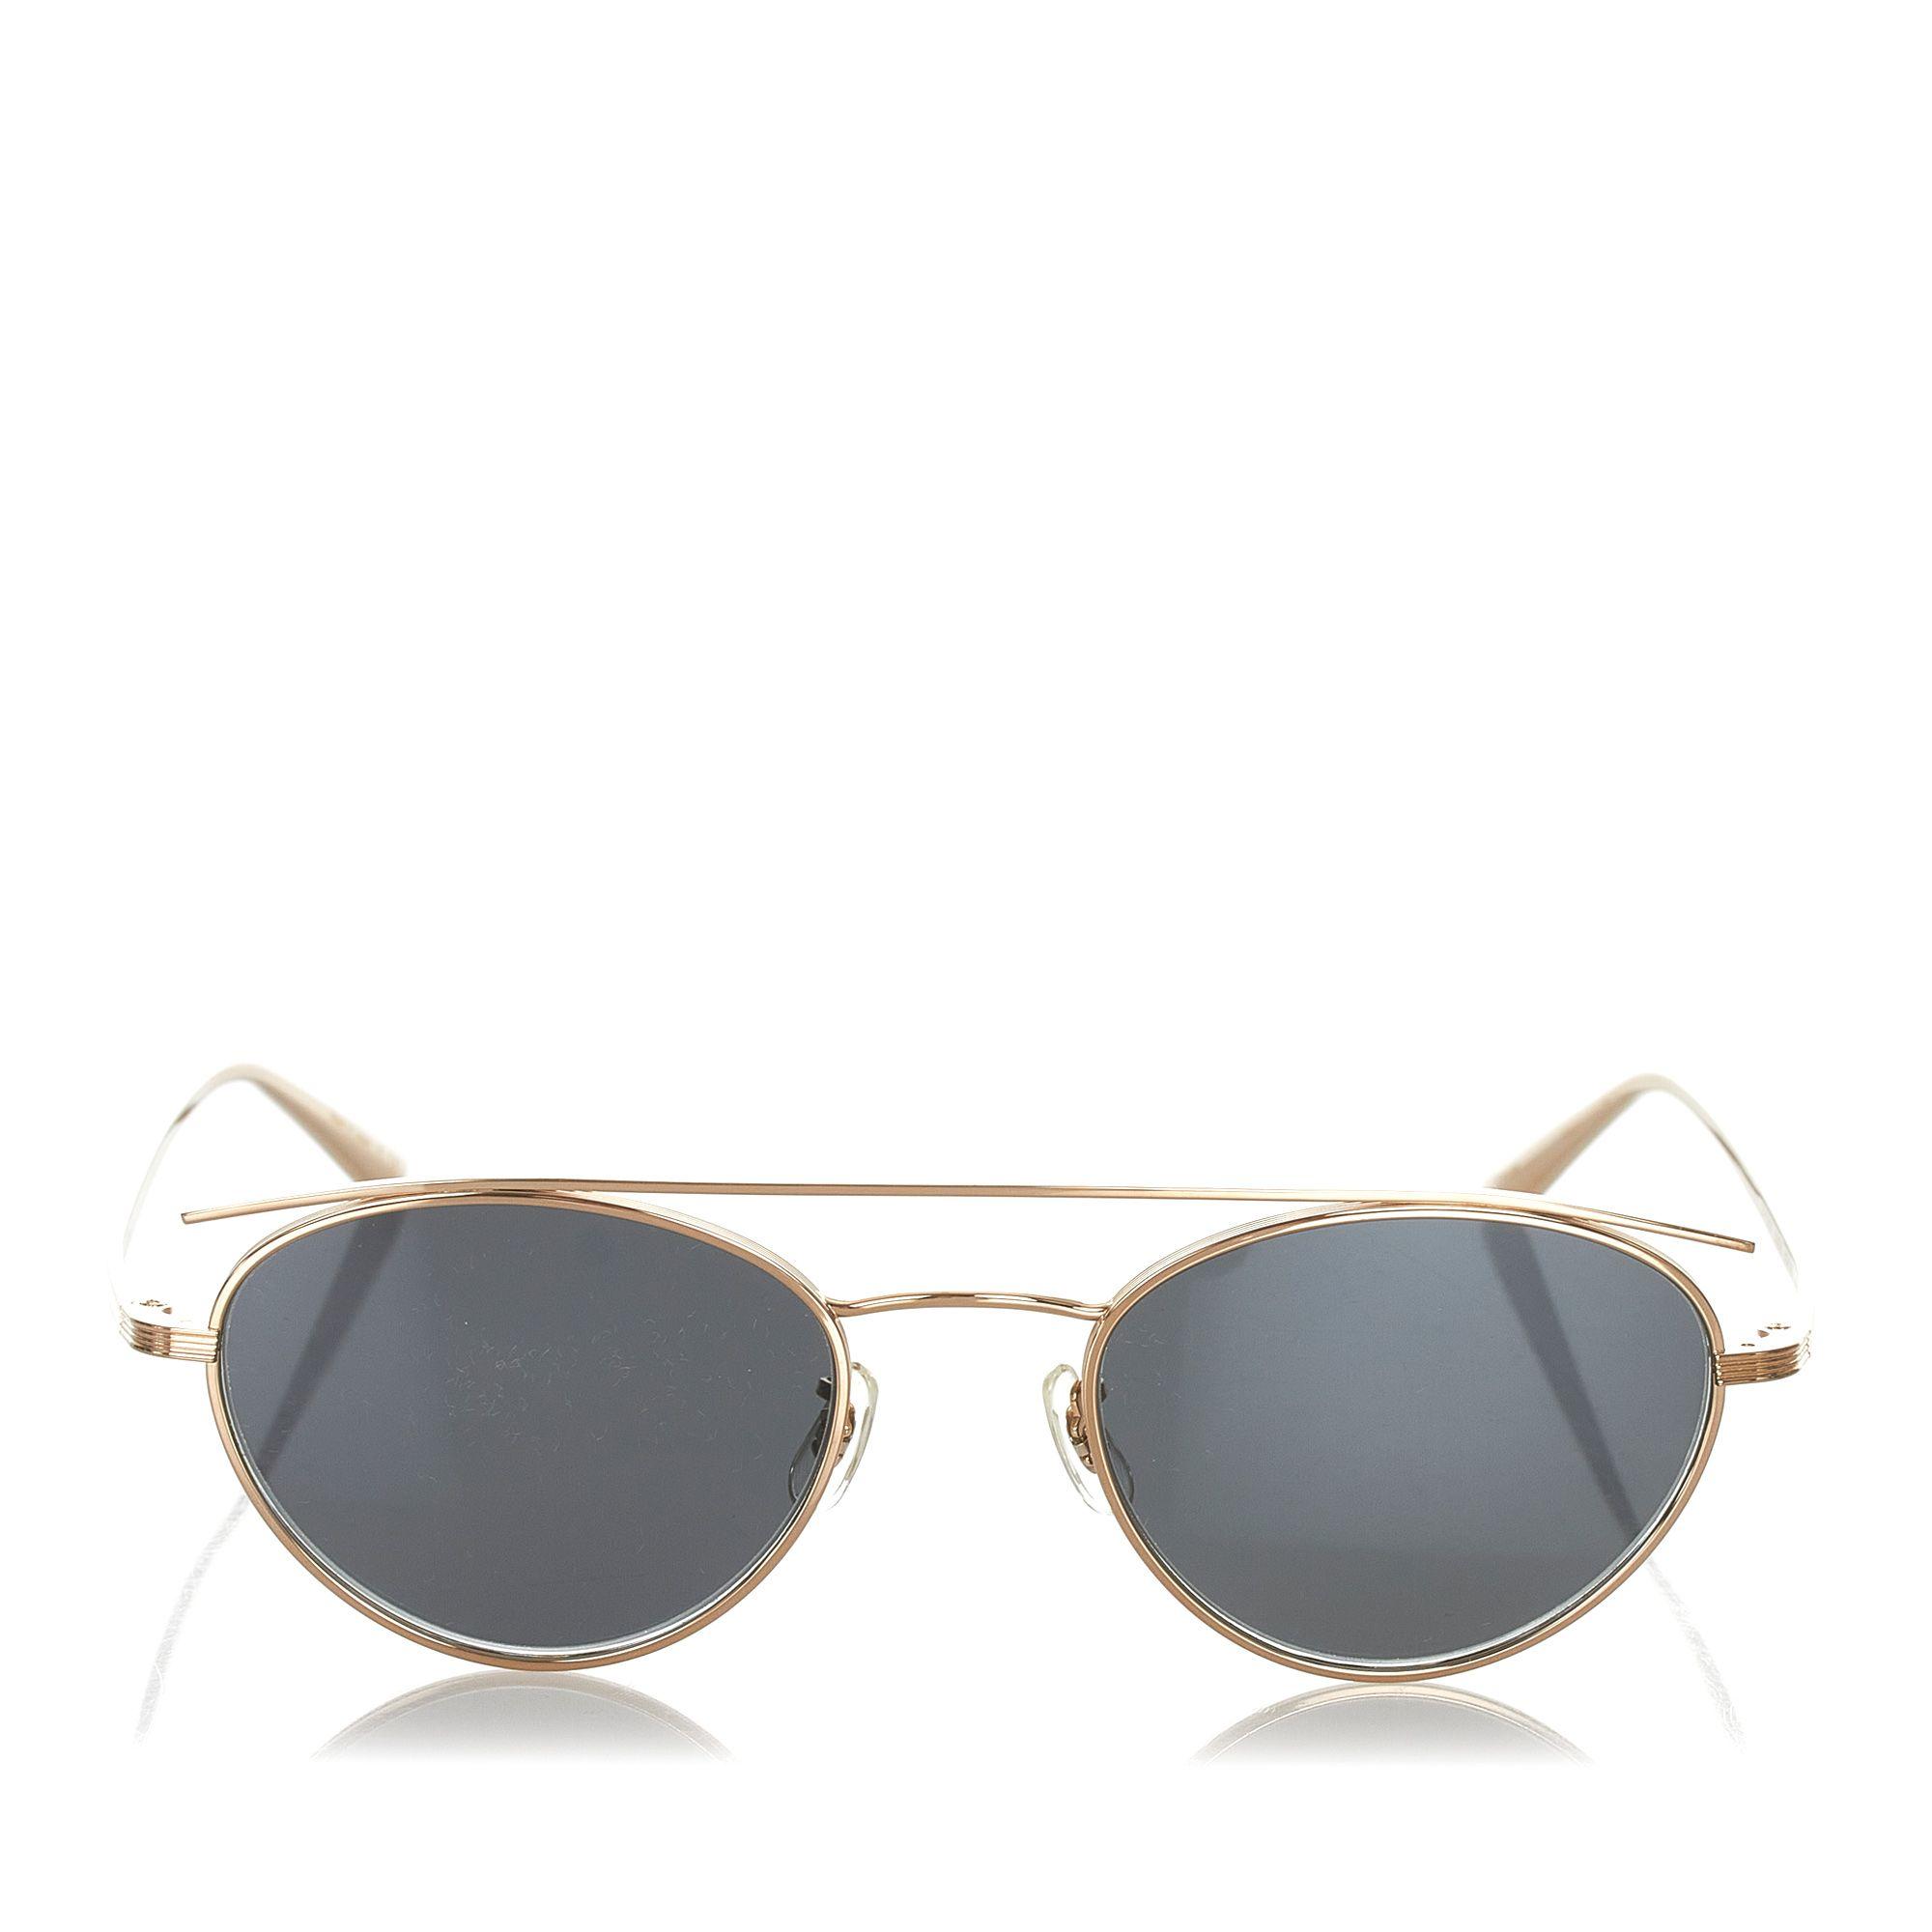 Vintage Oliver Peoples Round Tinted Sunglasses Black